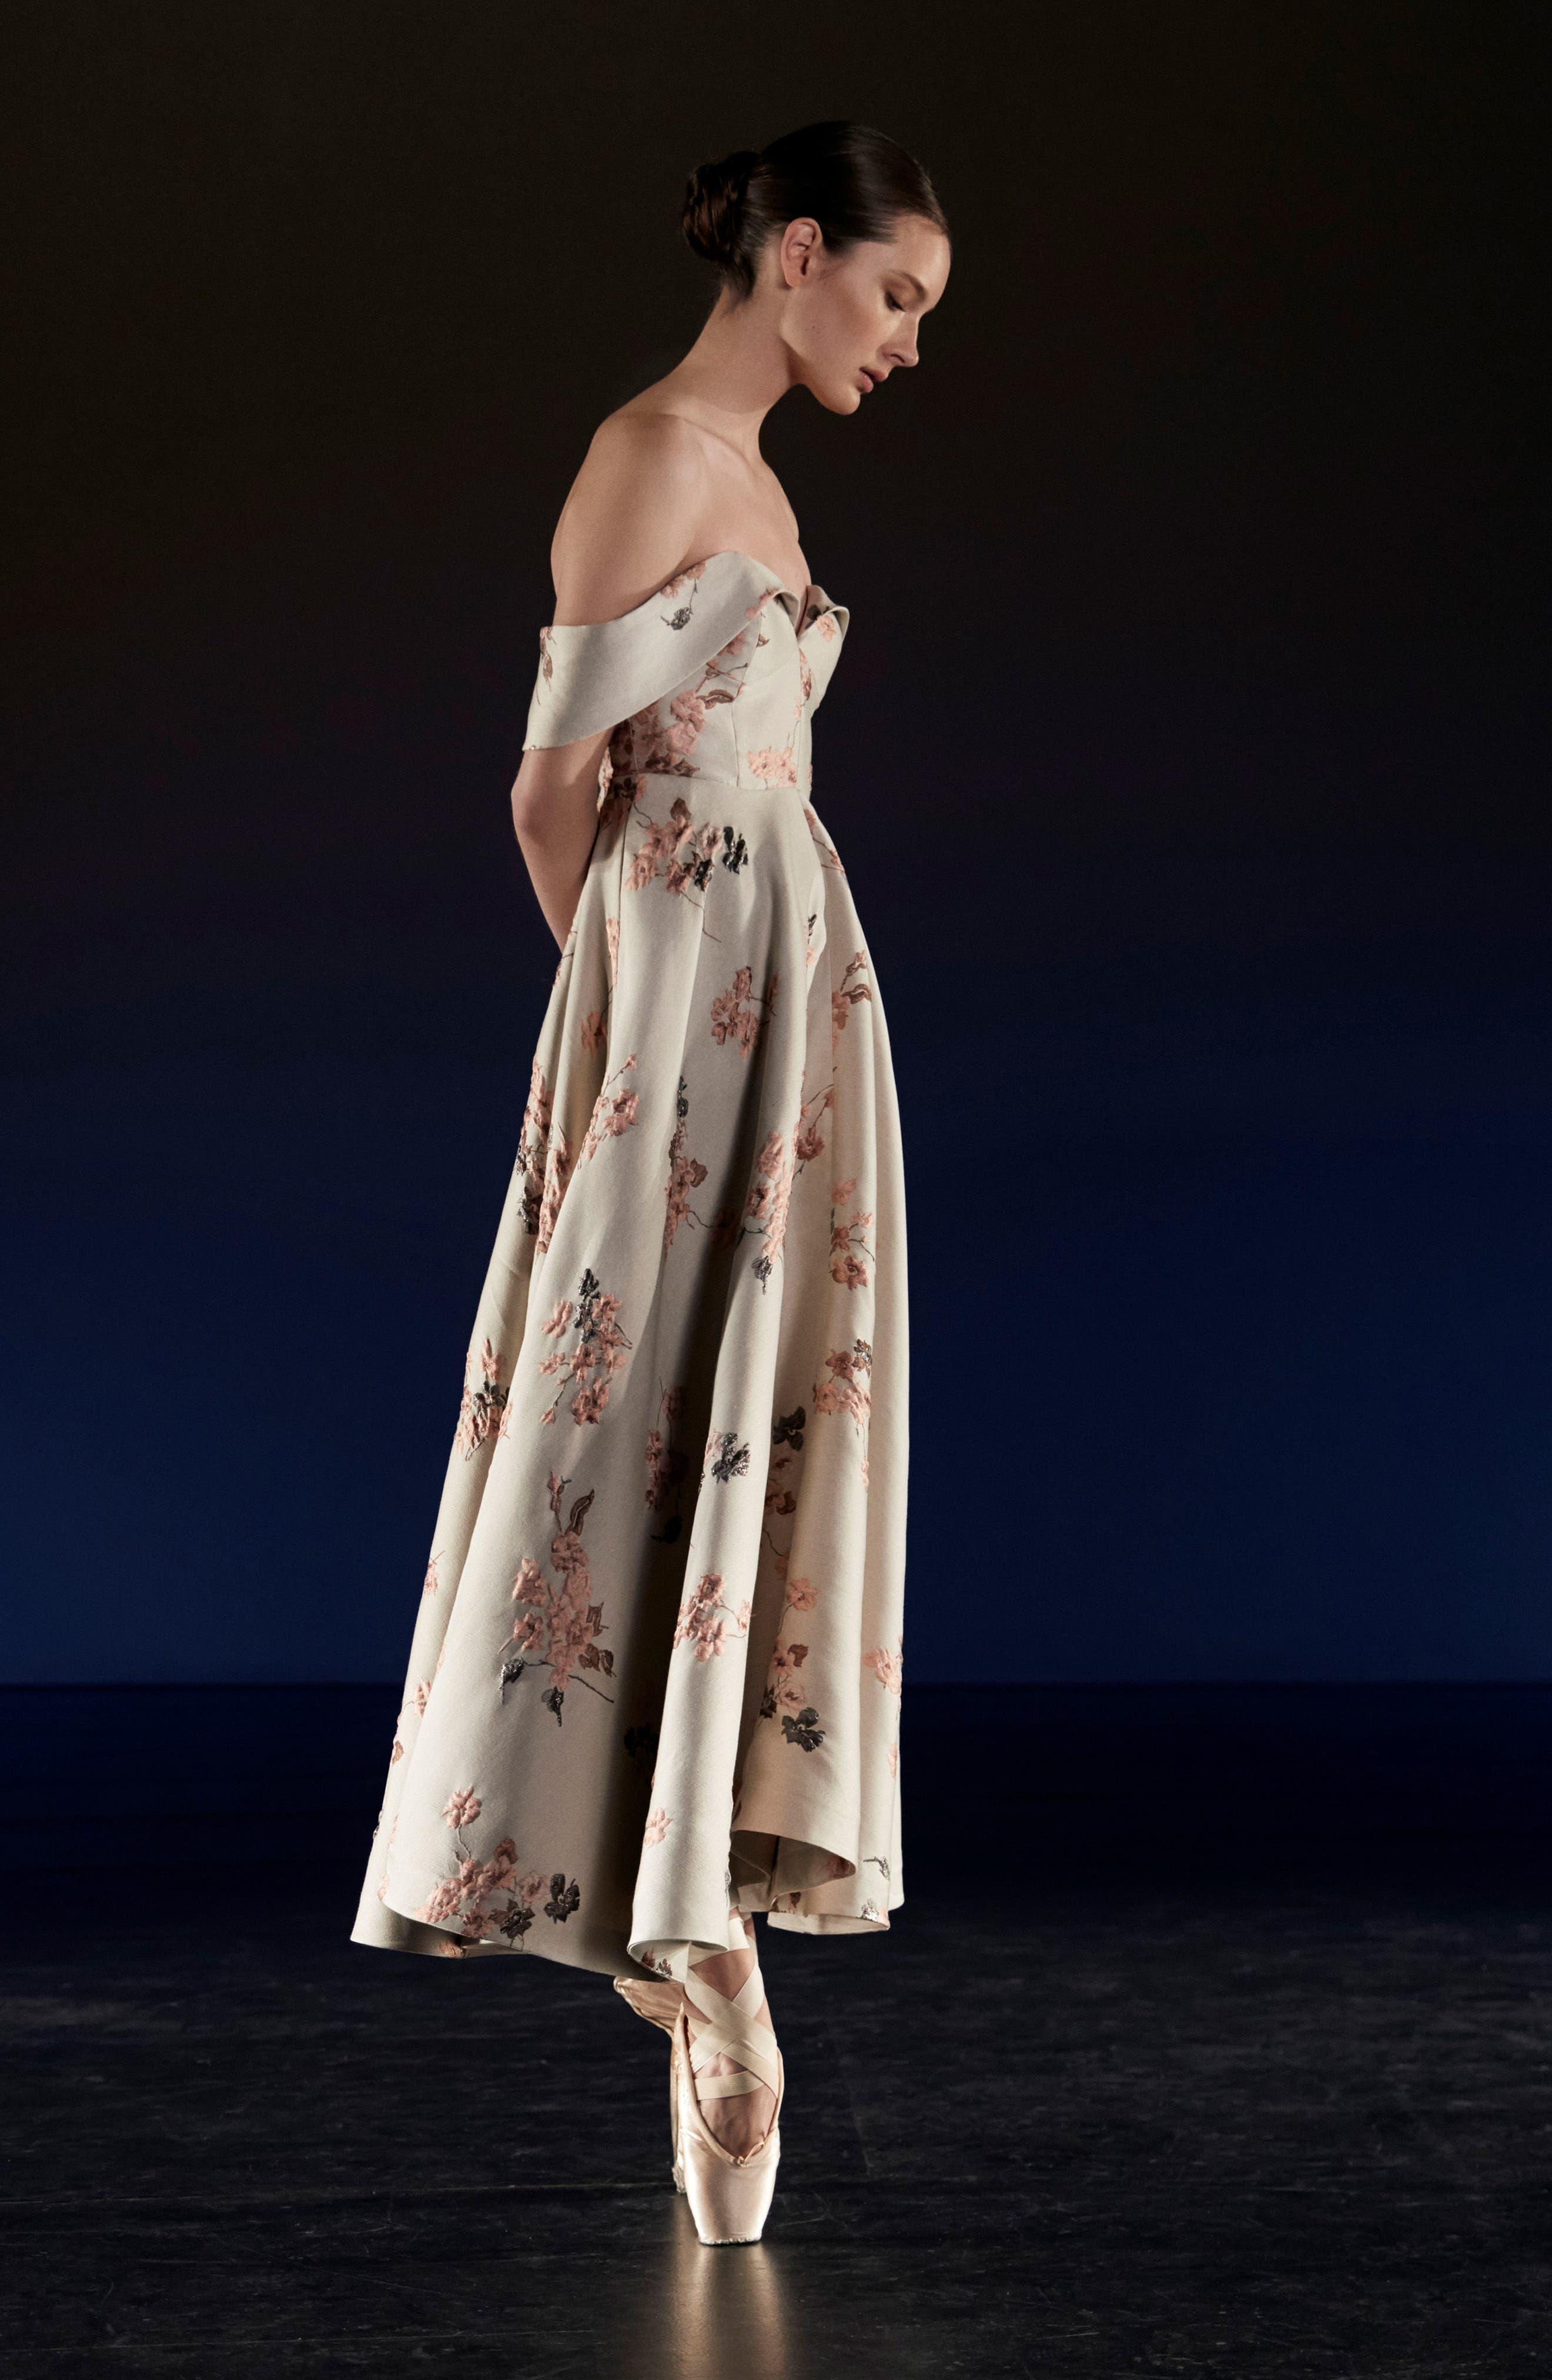 Metallic Floral Jacquard Off the Shoulder Dress,                             Alternate thumbnail 8, color,                             275